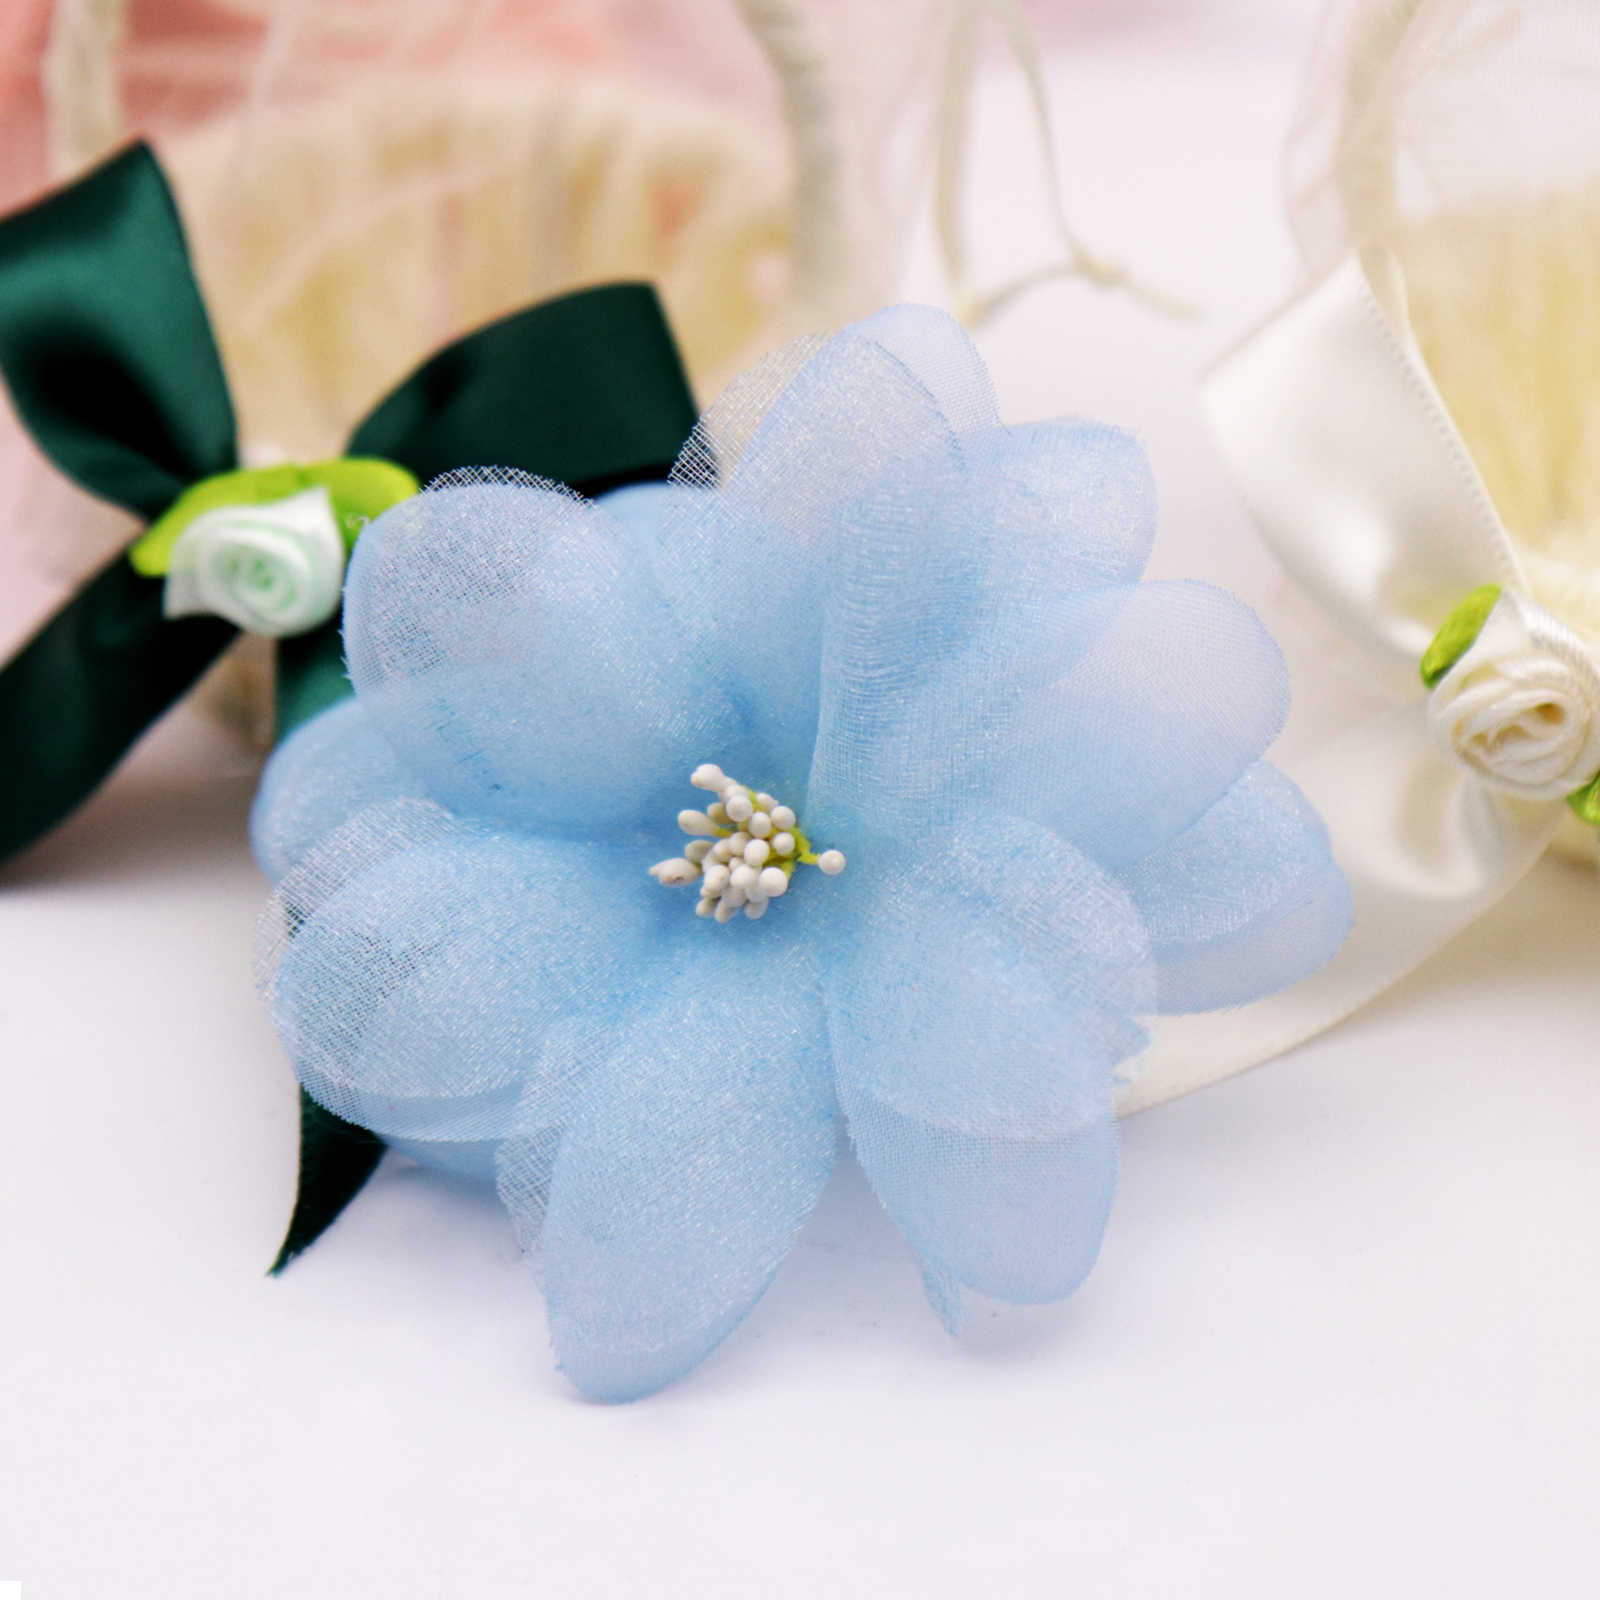 10Pcs 8.8X8.8 ซม.ประดิษฐ์ดอกไม้เพิร์ลพลัมดอกไม้หัวหมวกดอกไม้ตกแต่งDIYพวงหรีดคลิปดอกไม้ปลอม